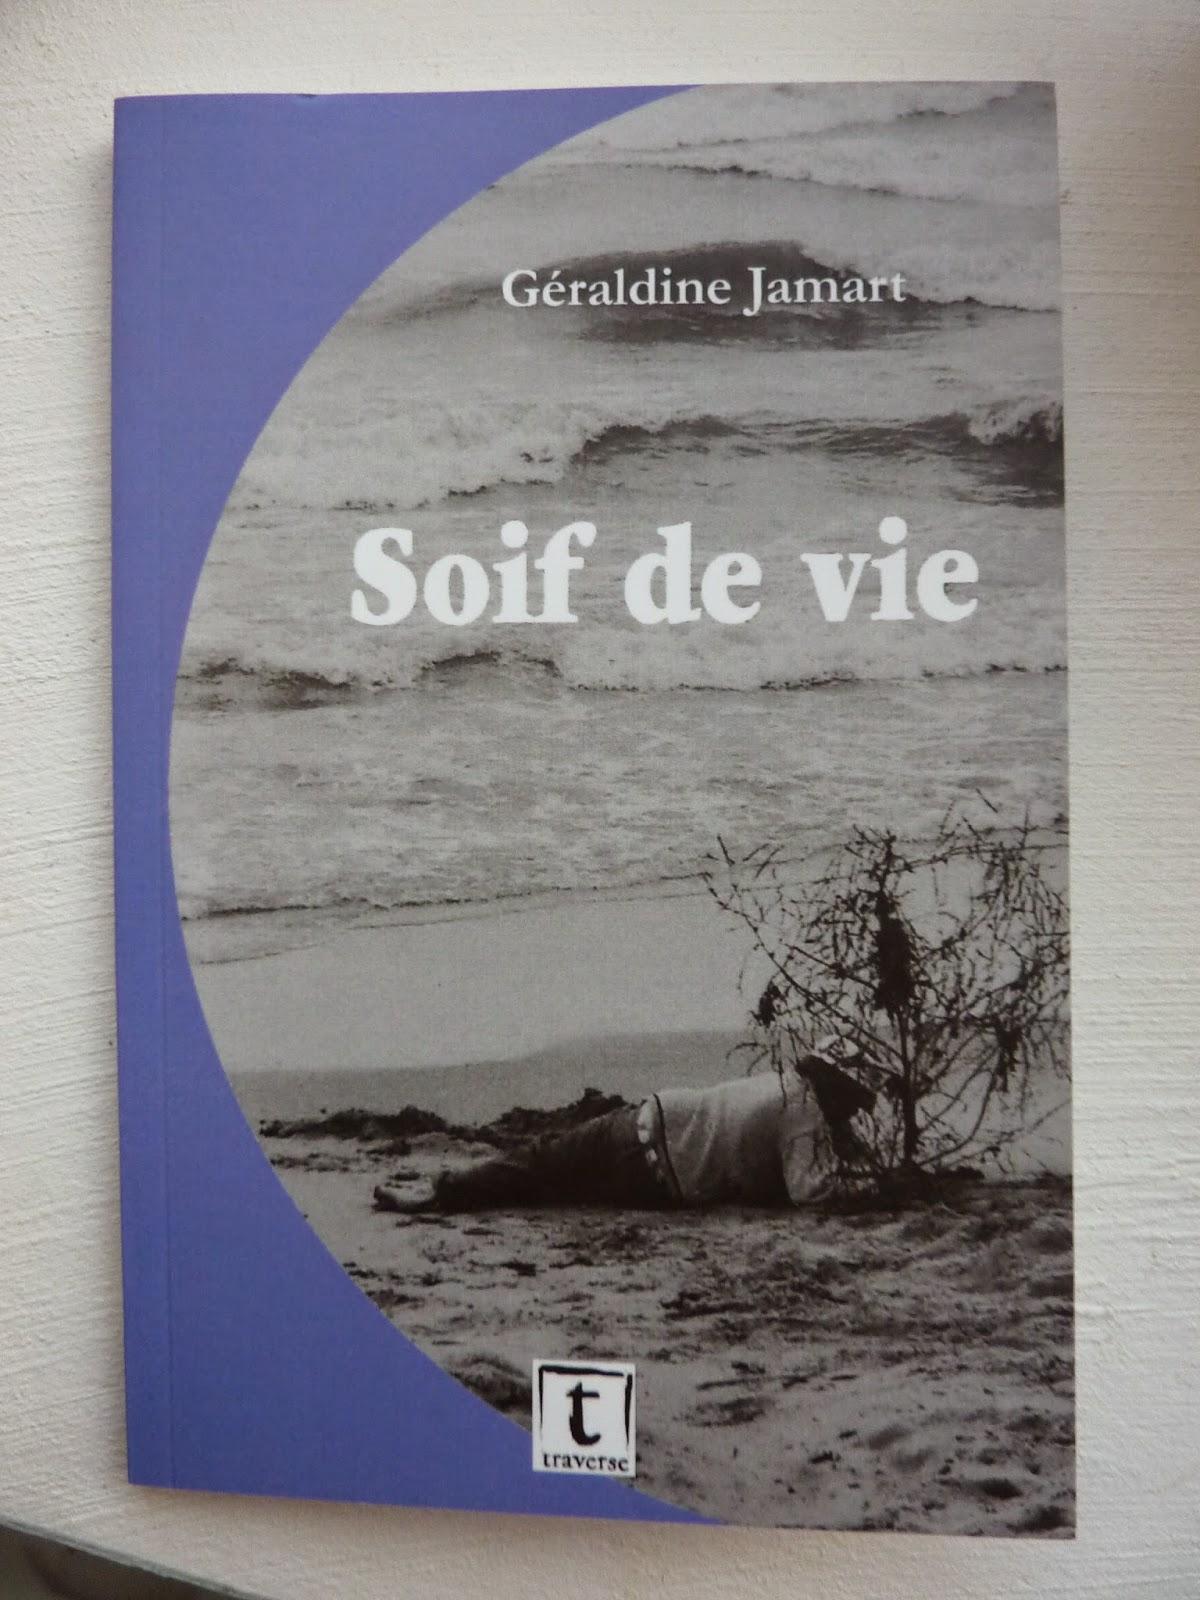 Soif de vie - Géraldine Jamart